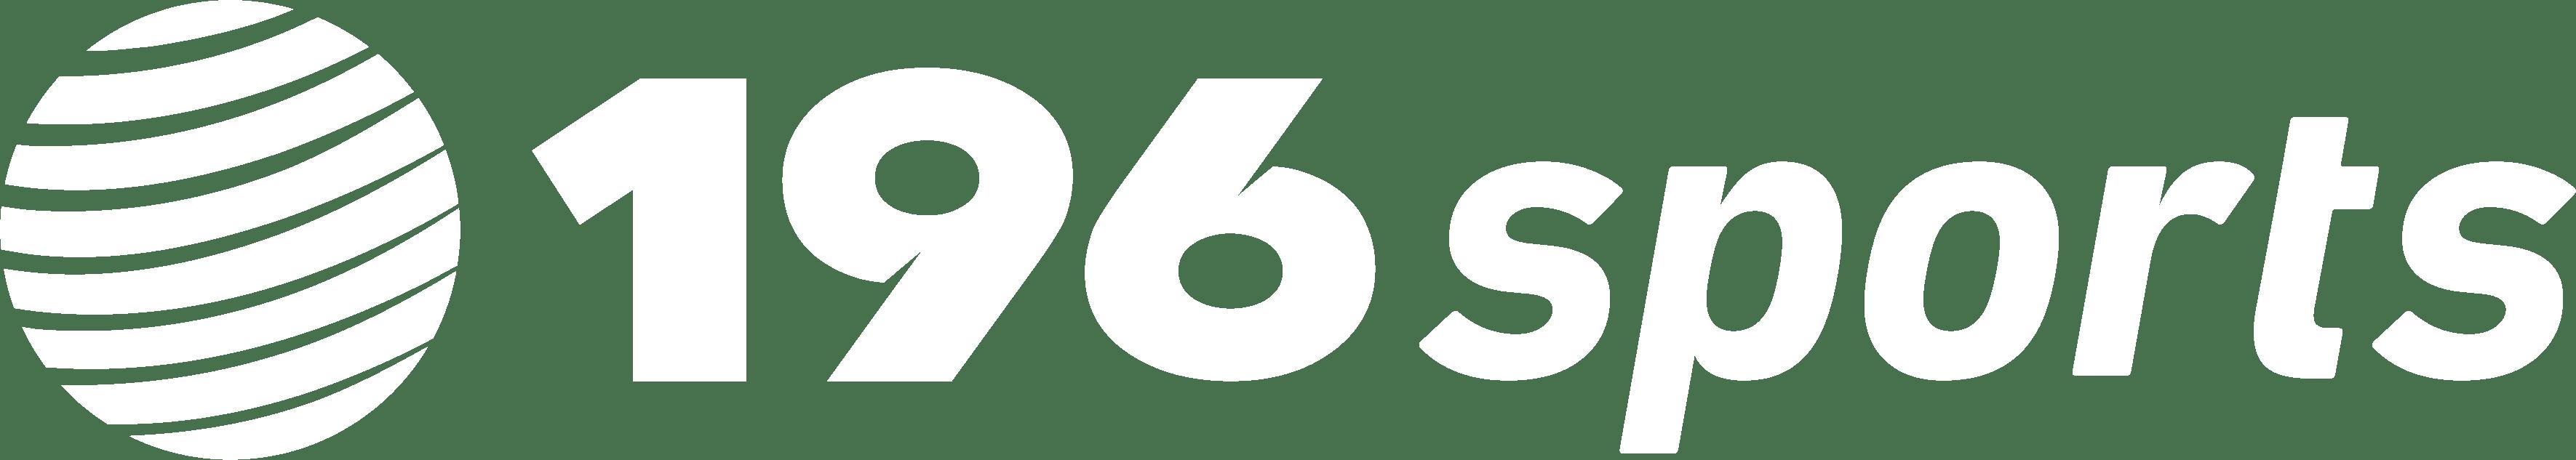 196 Sports